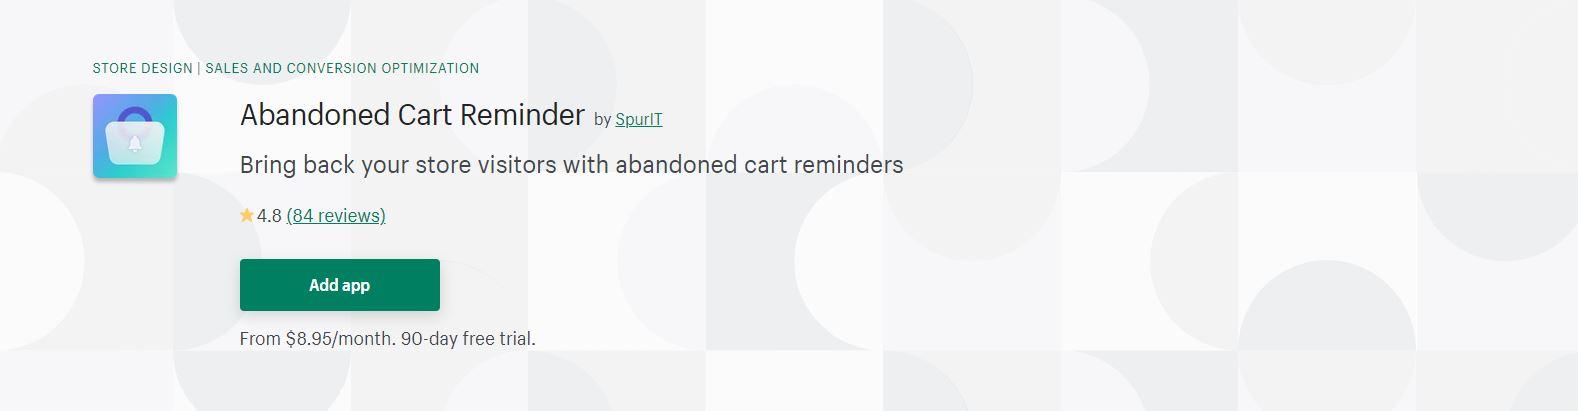 Abandoned Cart Reminder